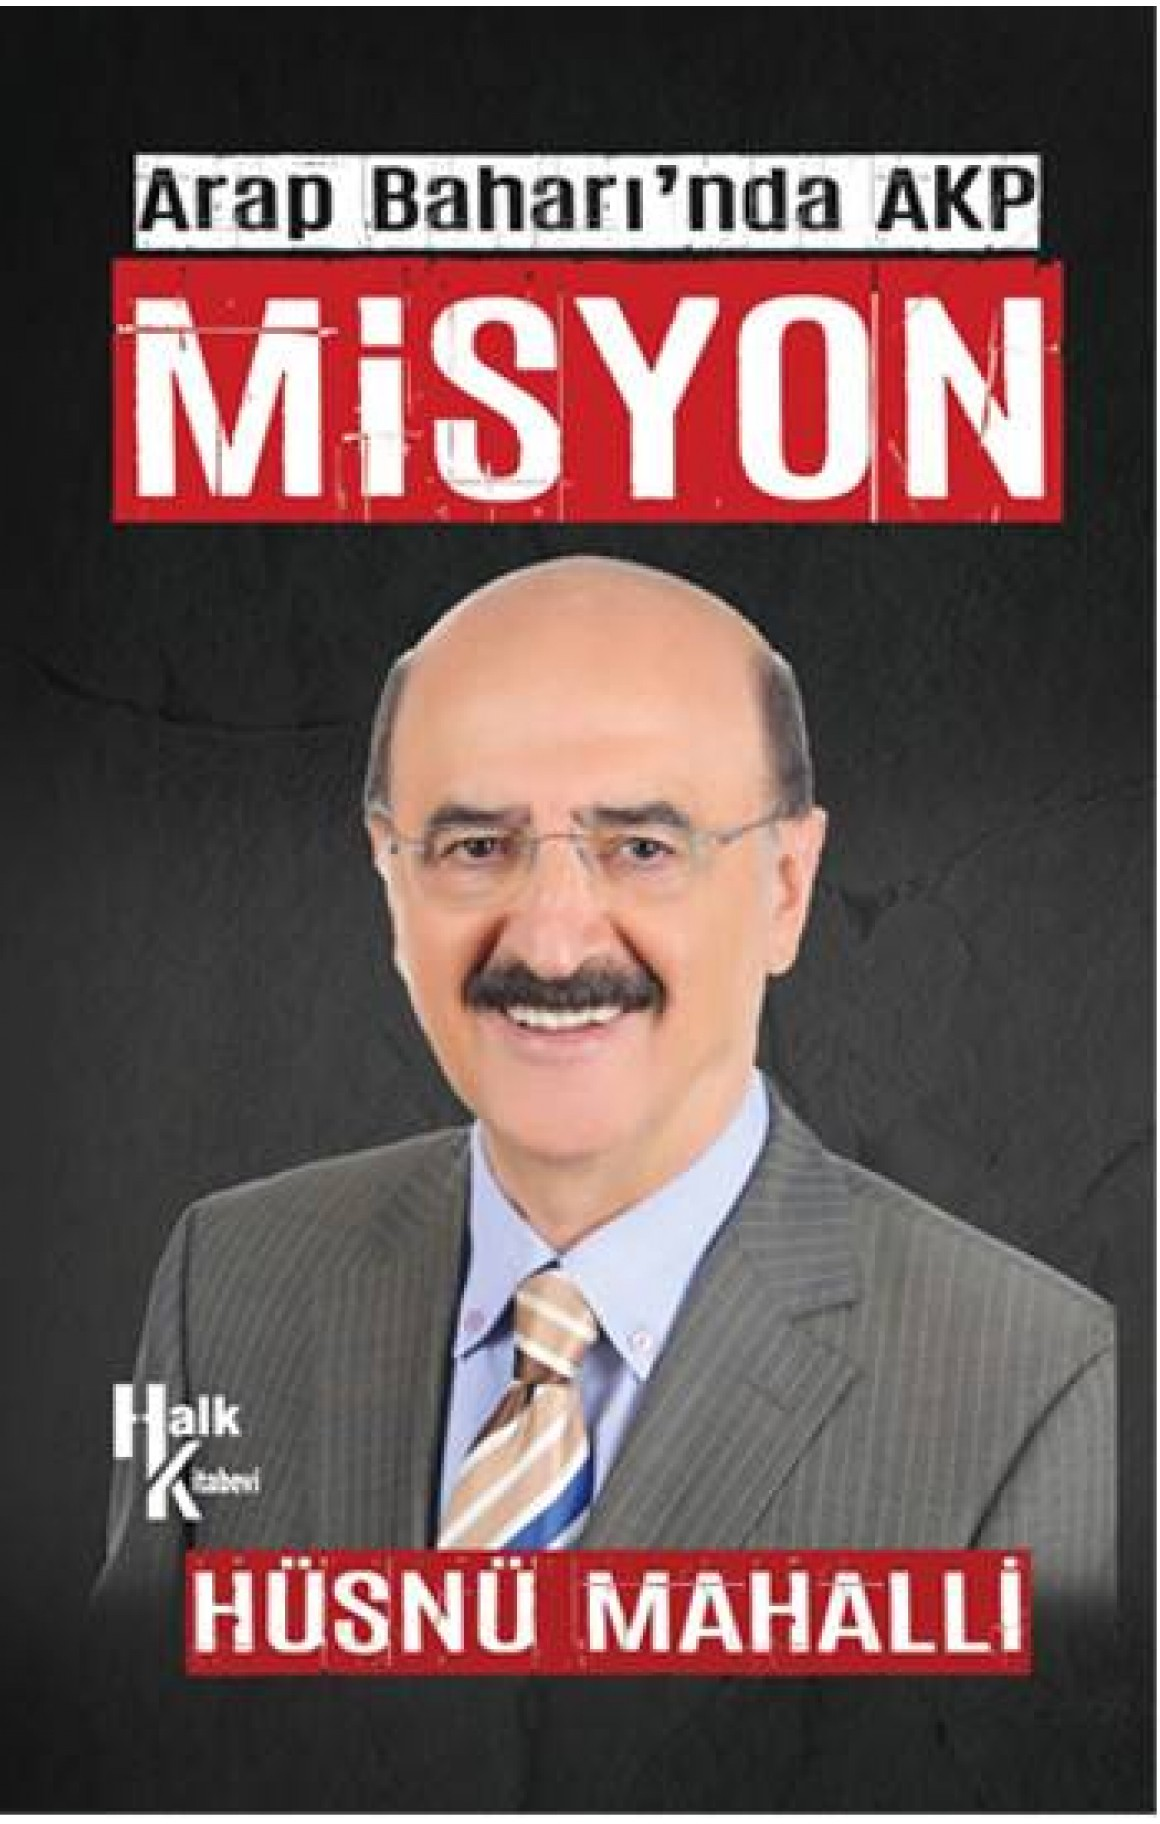 Arap Baharında AKP Misyon